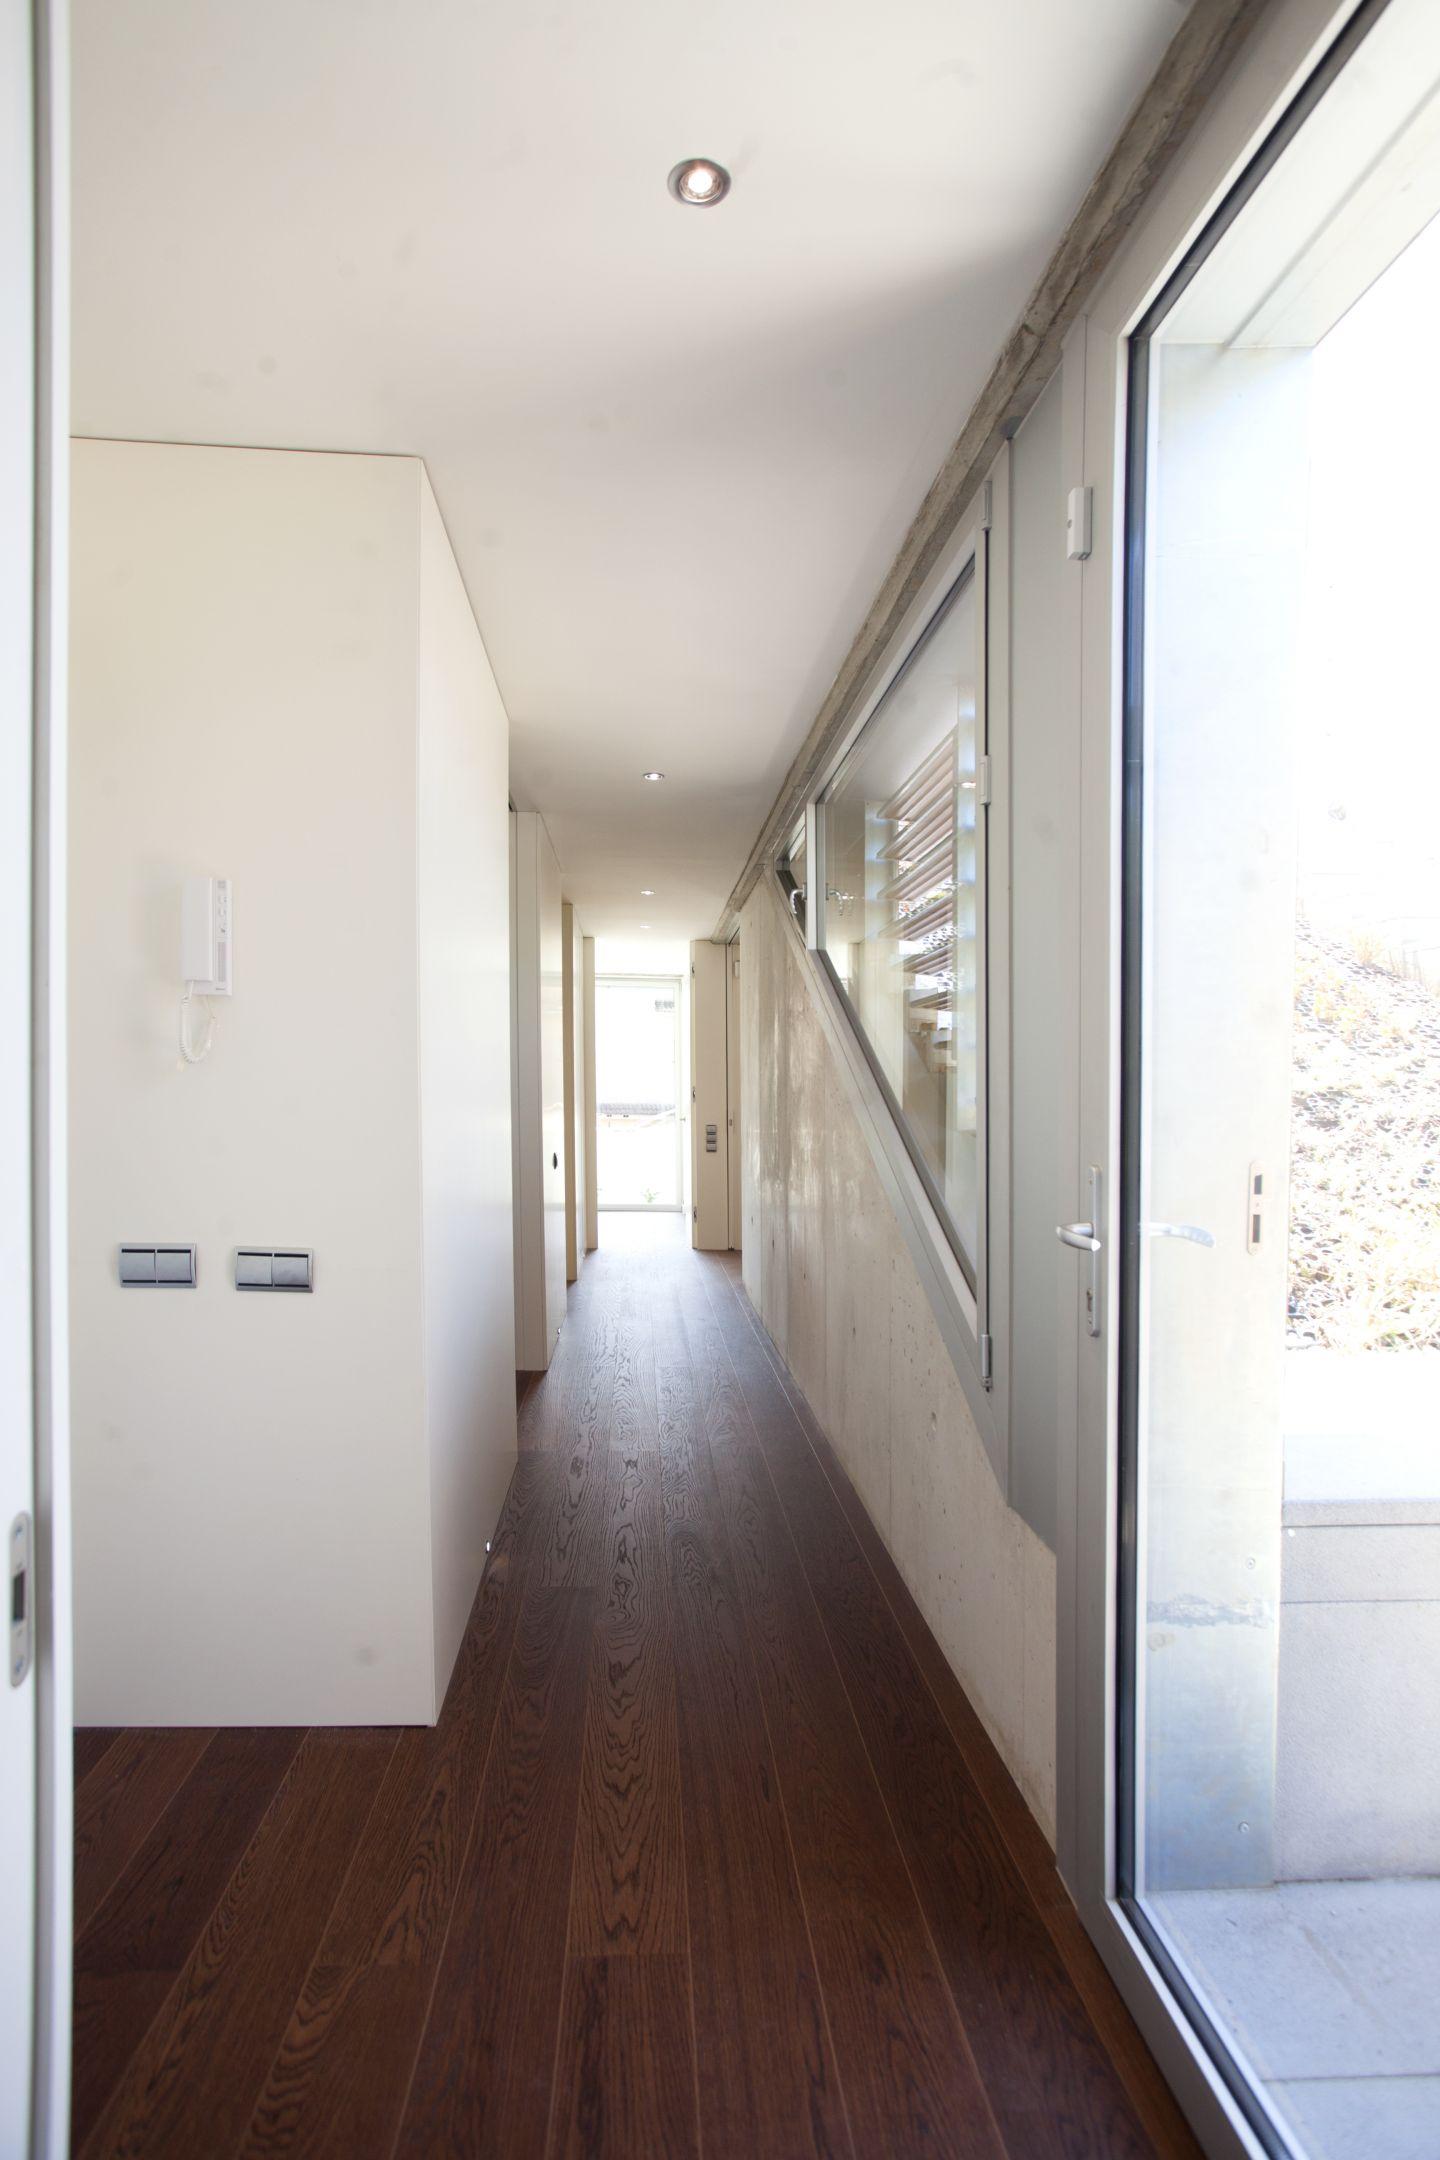 roa-arquitectura-sostenibilidad-residencial unifamiliar-nzeb 14